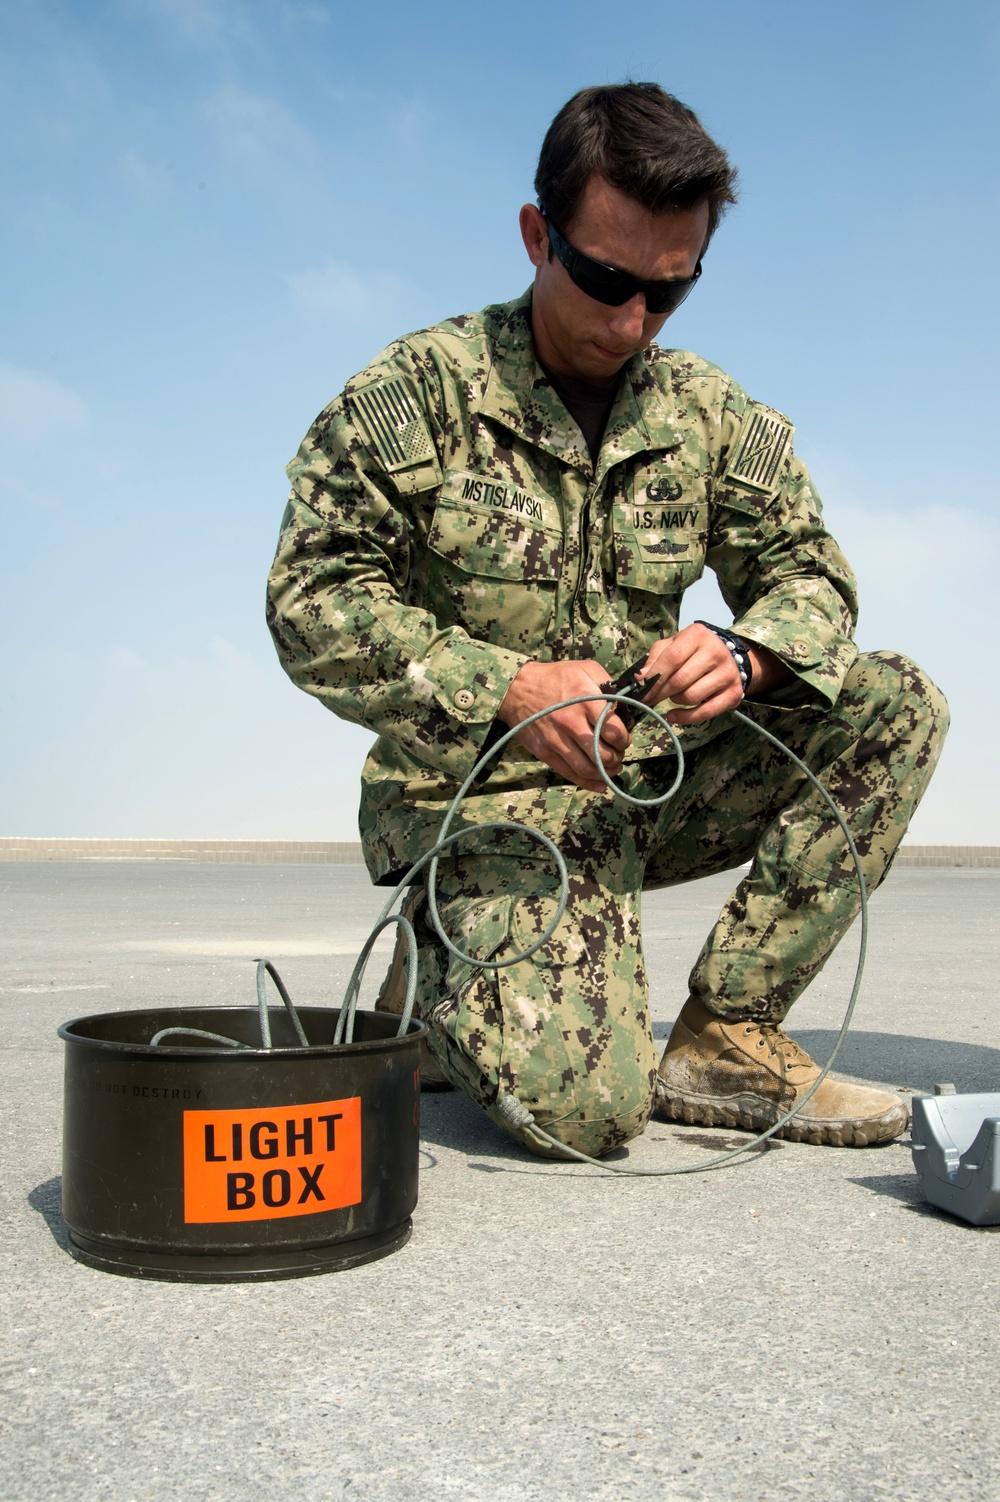 Neon Response 18: Surface Demolition Operations / Landmine Clearance Procedures